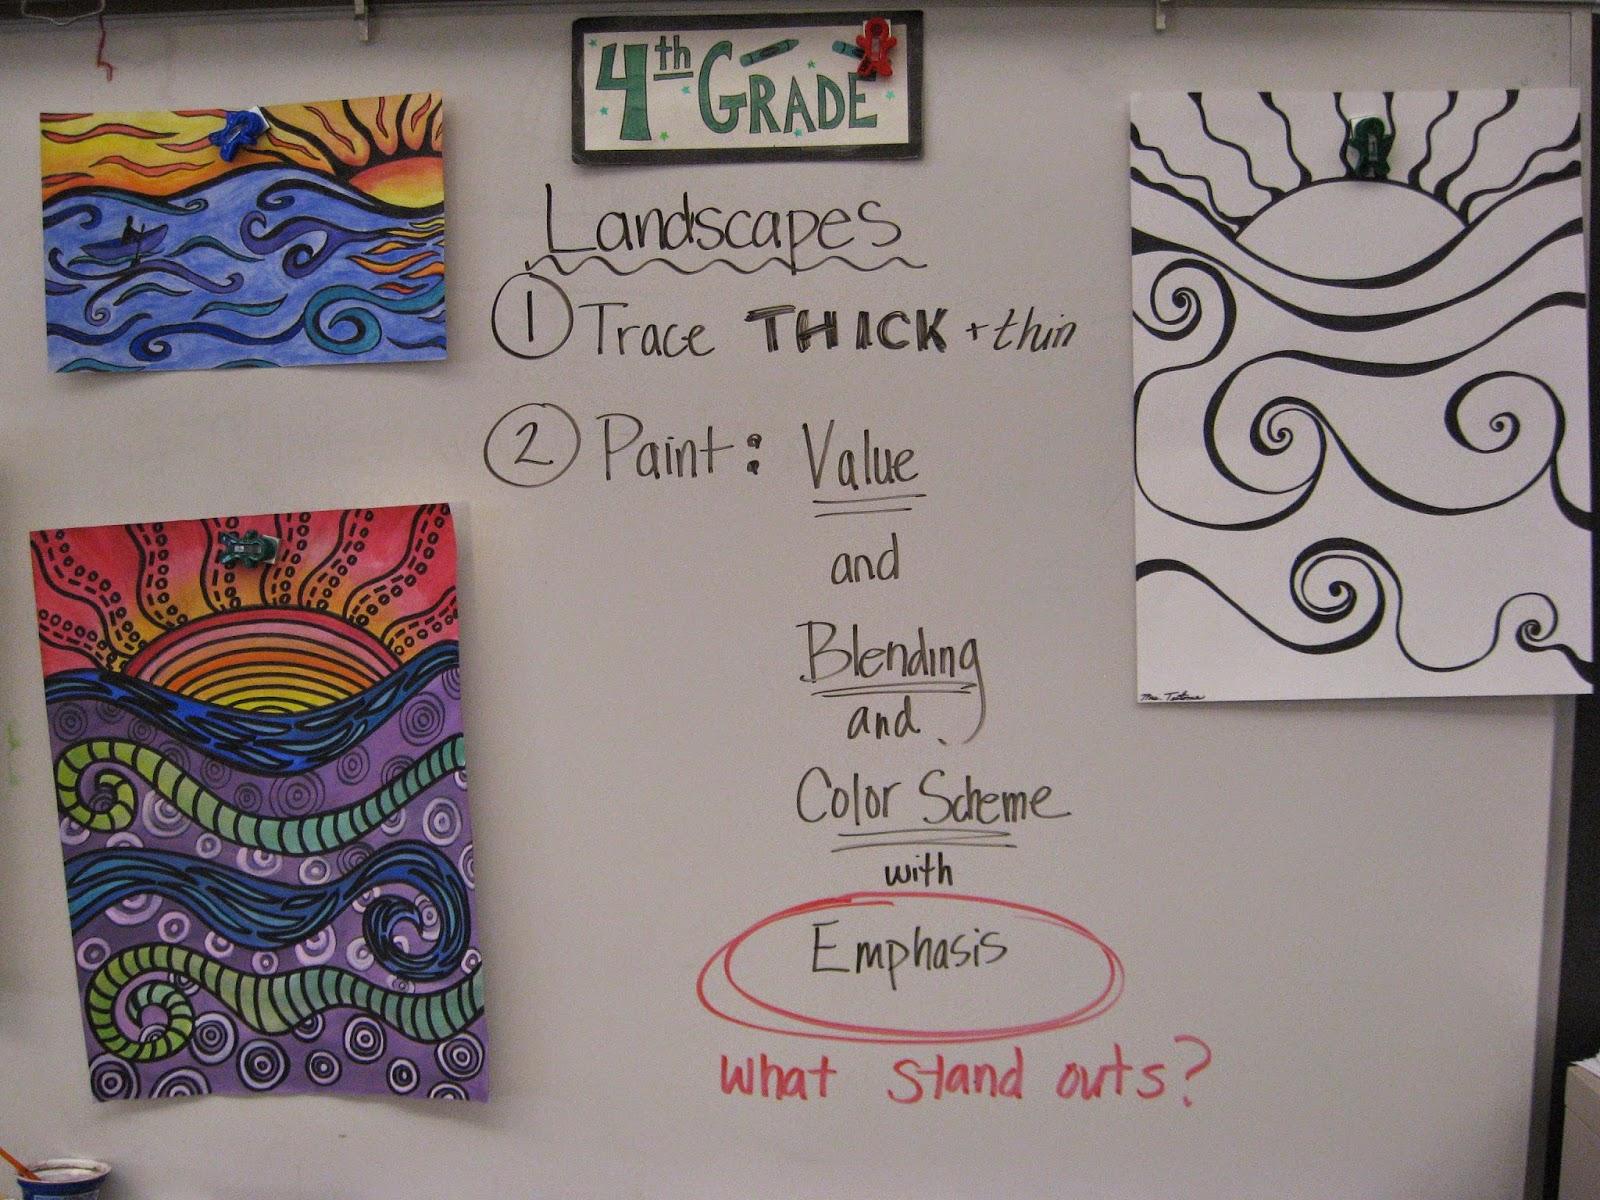 Jamestown Elementary Art Blog 4th Grade Landscapes